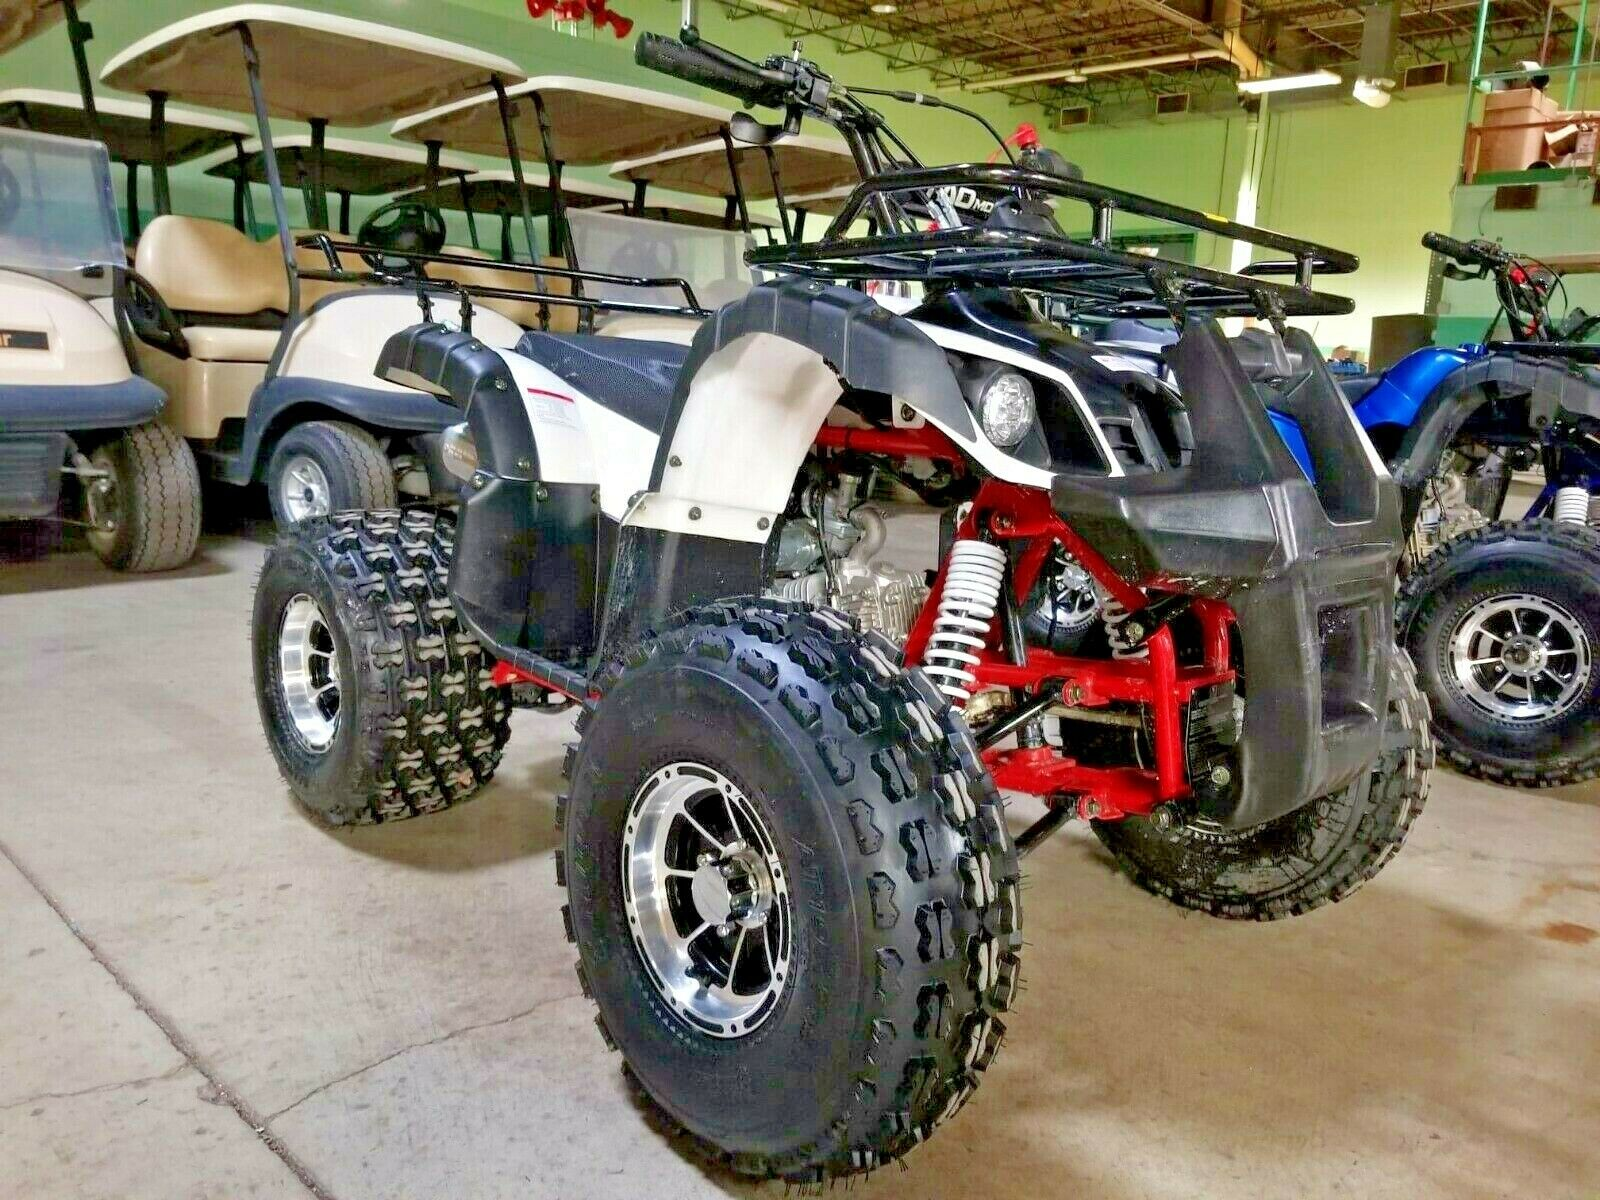 125cc Quad TForce Four Wheeler Utility ATV 4 Wheeler w/Auto Trans